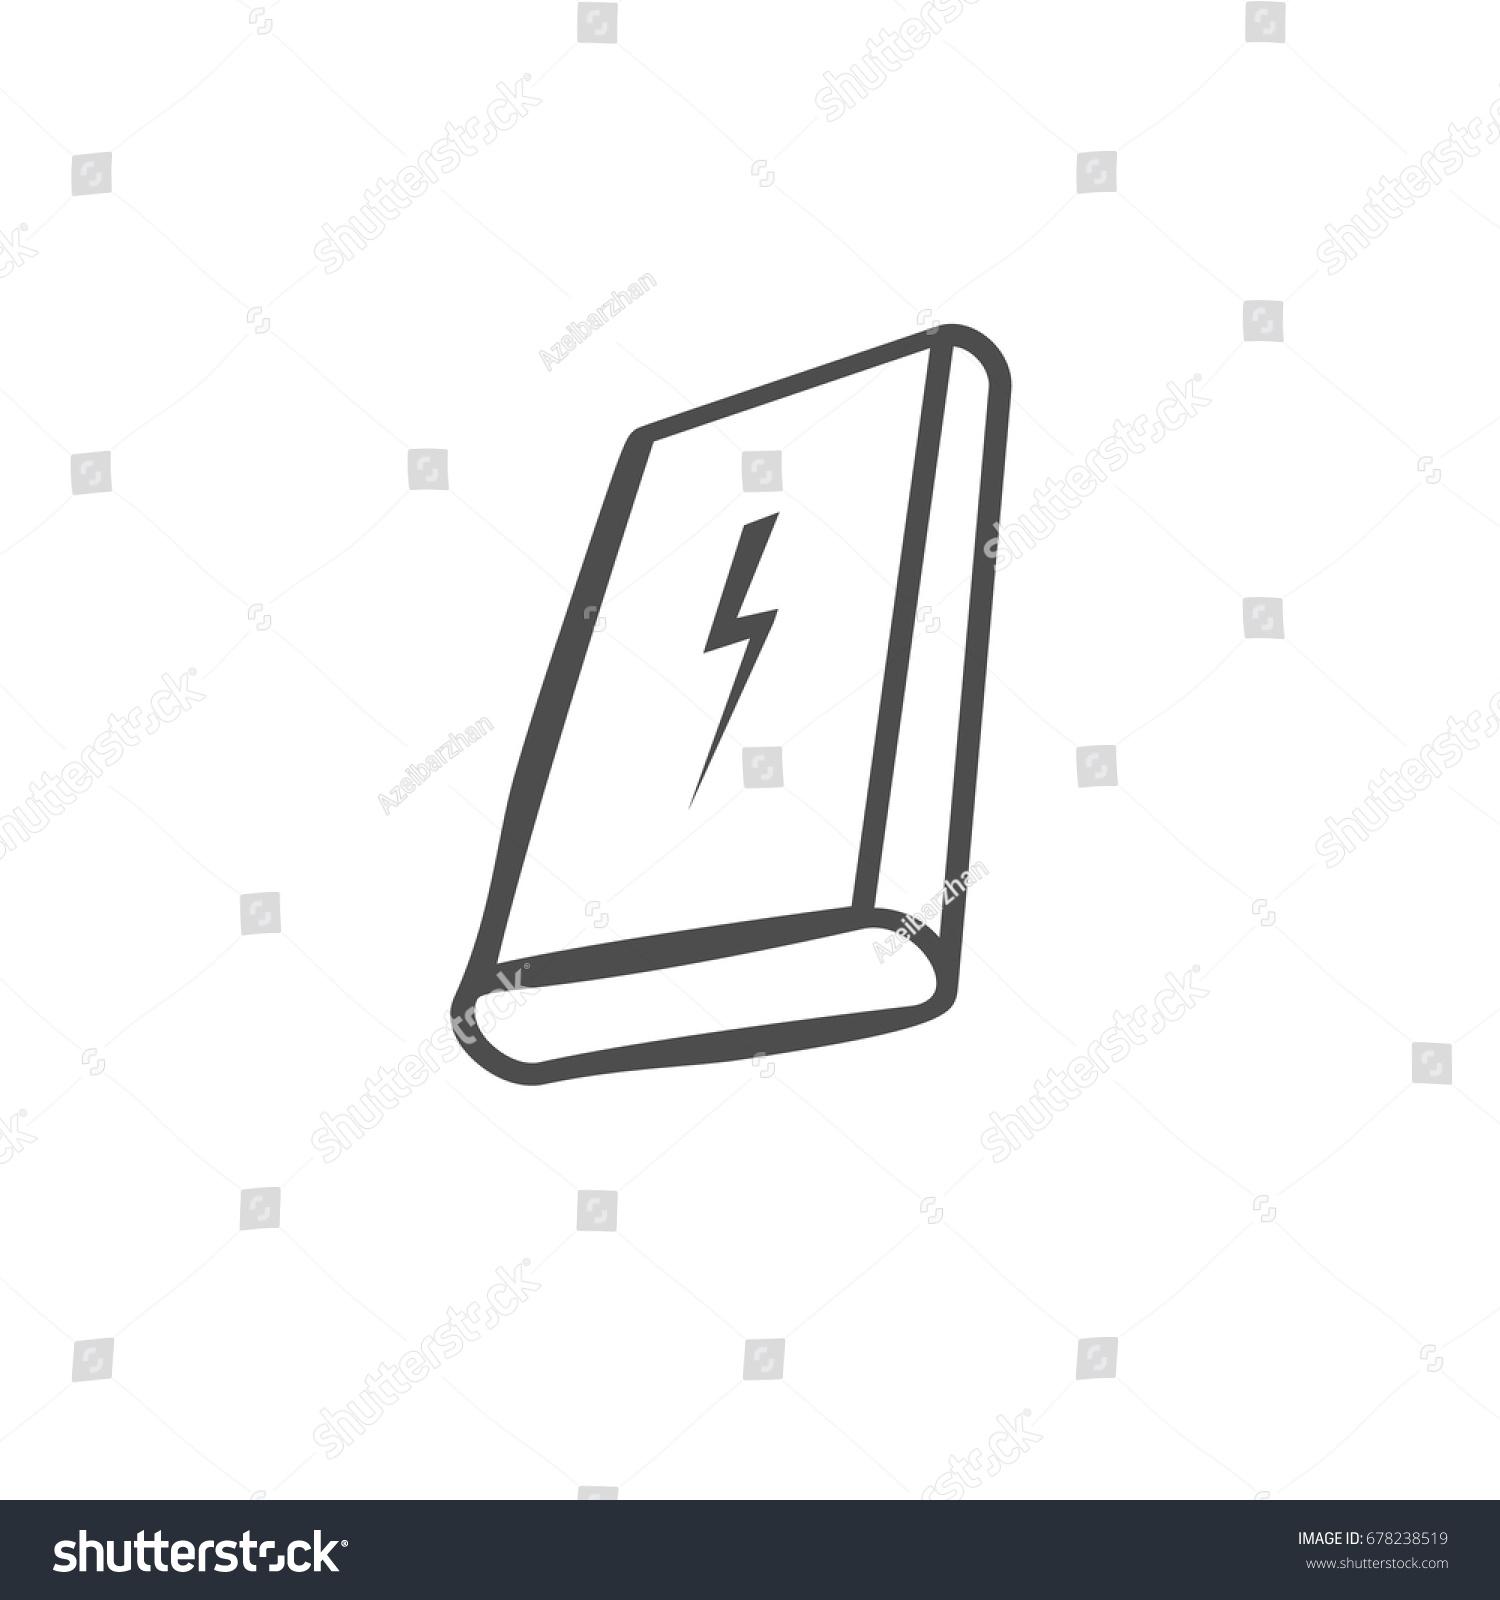 Power bank icon portable charging device stock vector 678238519 power bank icon portable charging device vector illustration buycottarizona Images